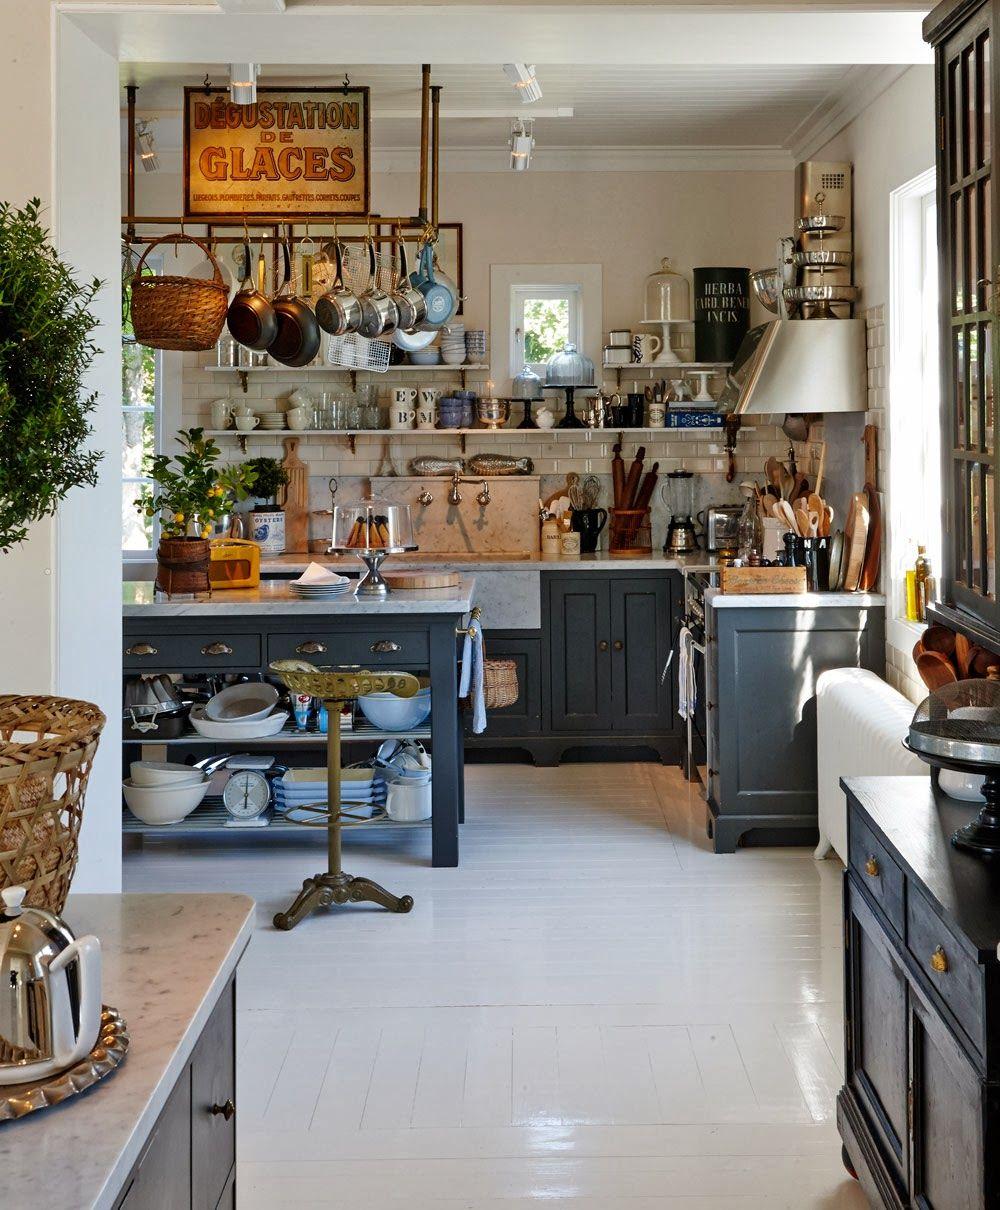 nice kitchen track lighting interior decor. Nicely Cluttered Kitchen | Ditch The Track Lighting Nice Interior Decor